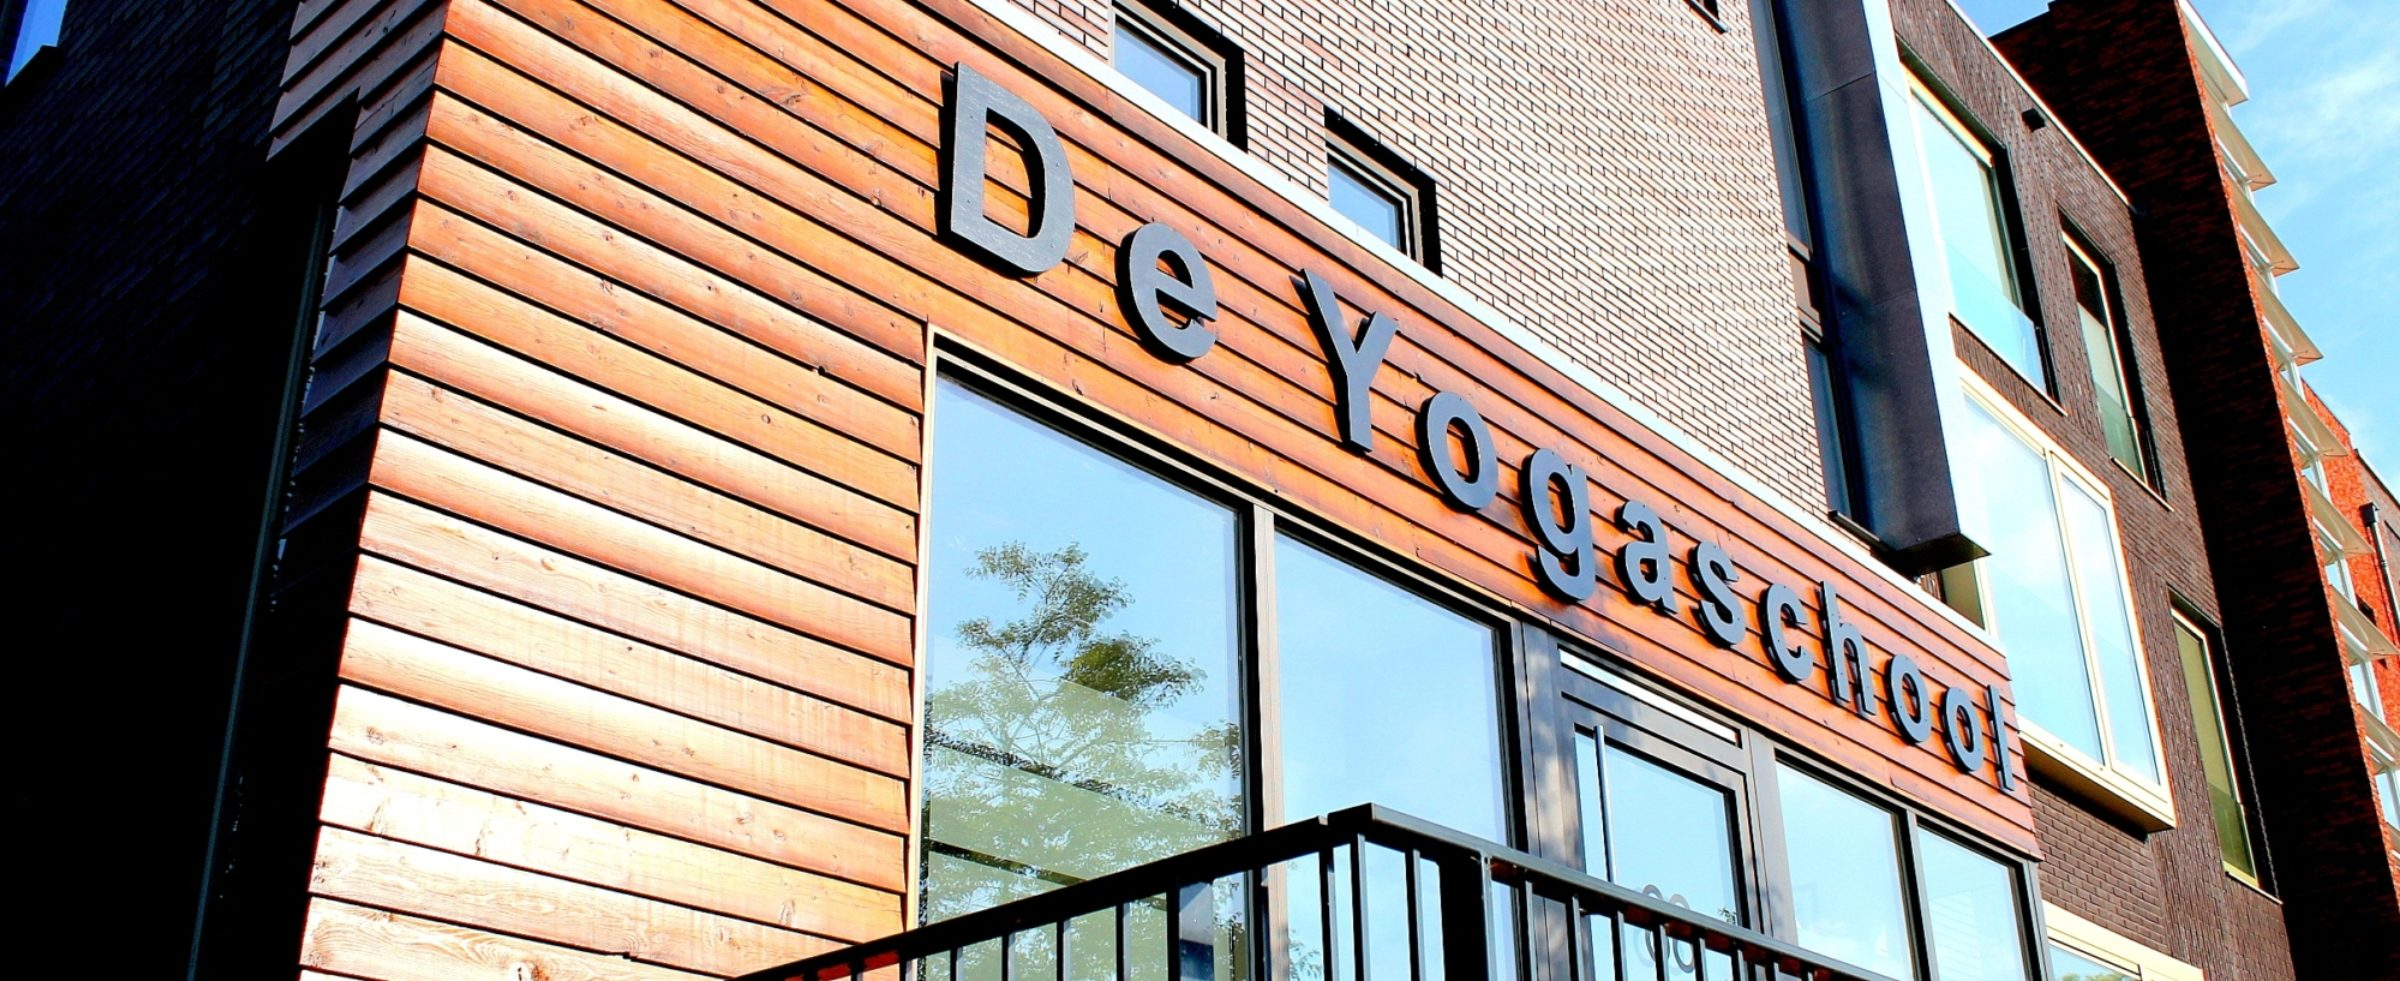 De Yogaschool328129